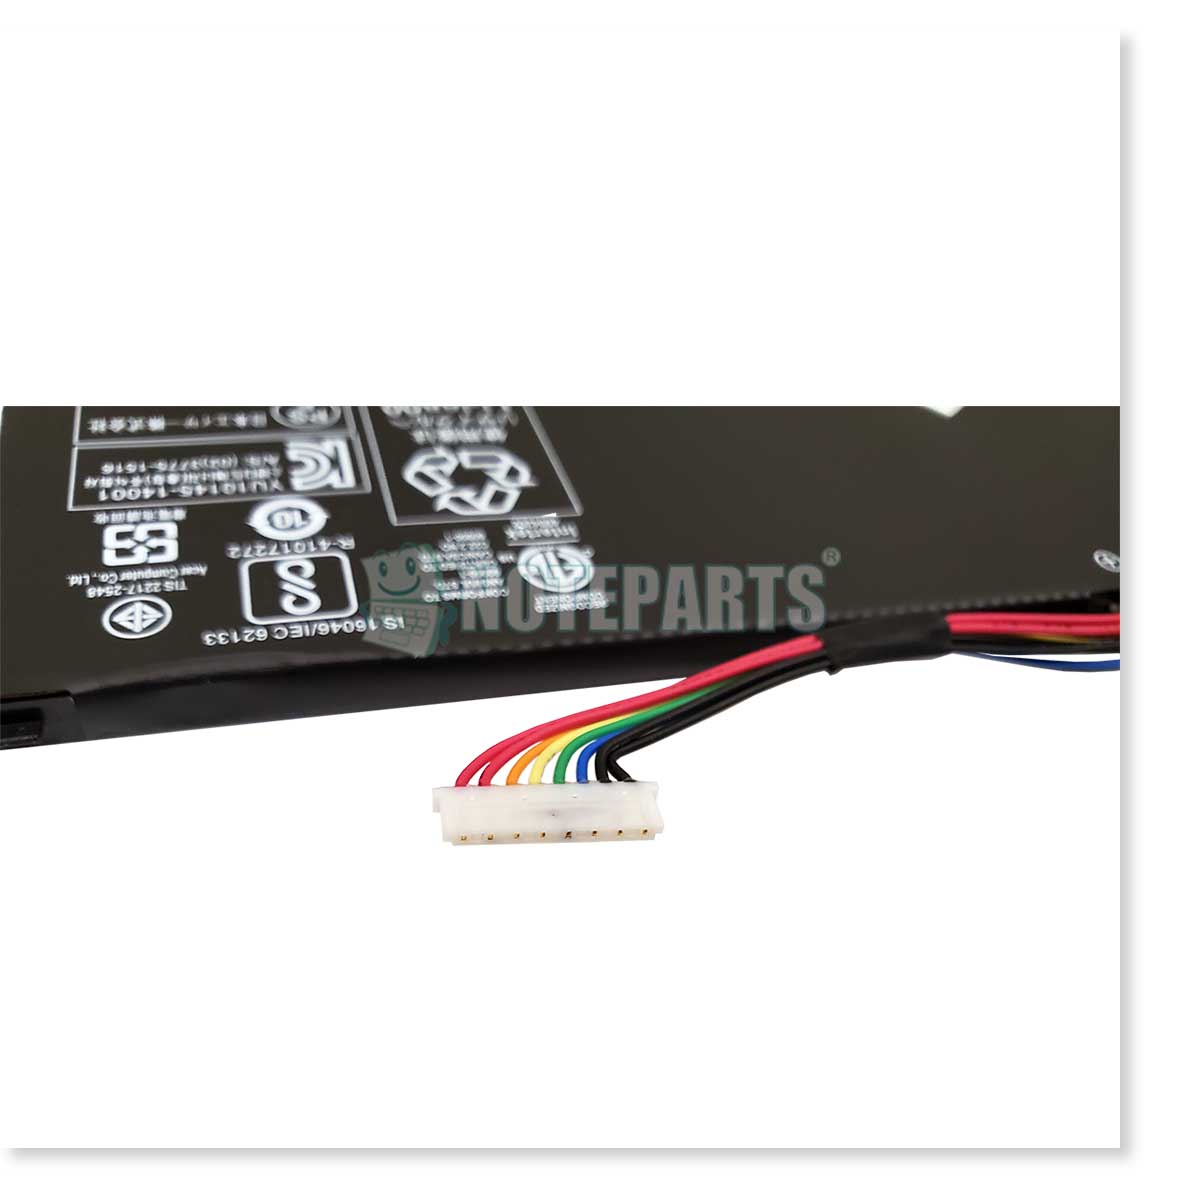 Acer純正 エイサー Swift 3 SF313-513 SF314-54 SF314-56 バッテリー AC14B7K